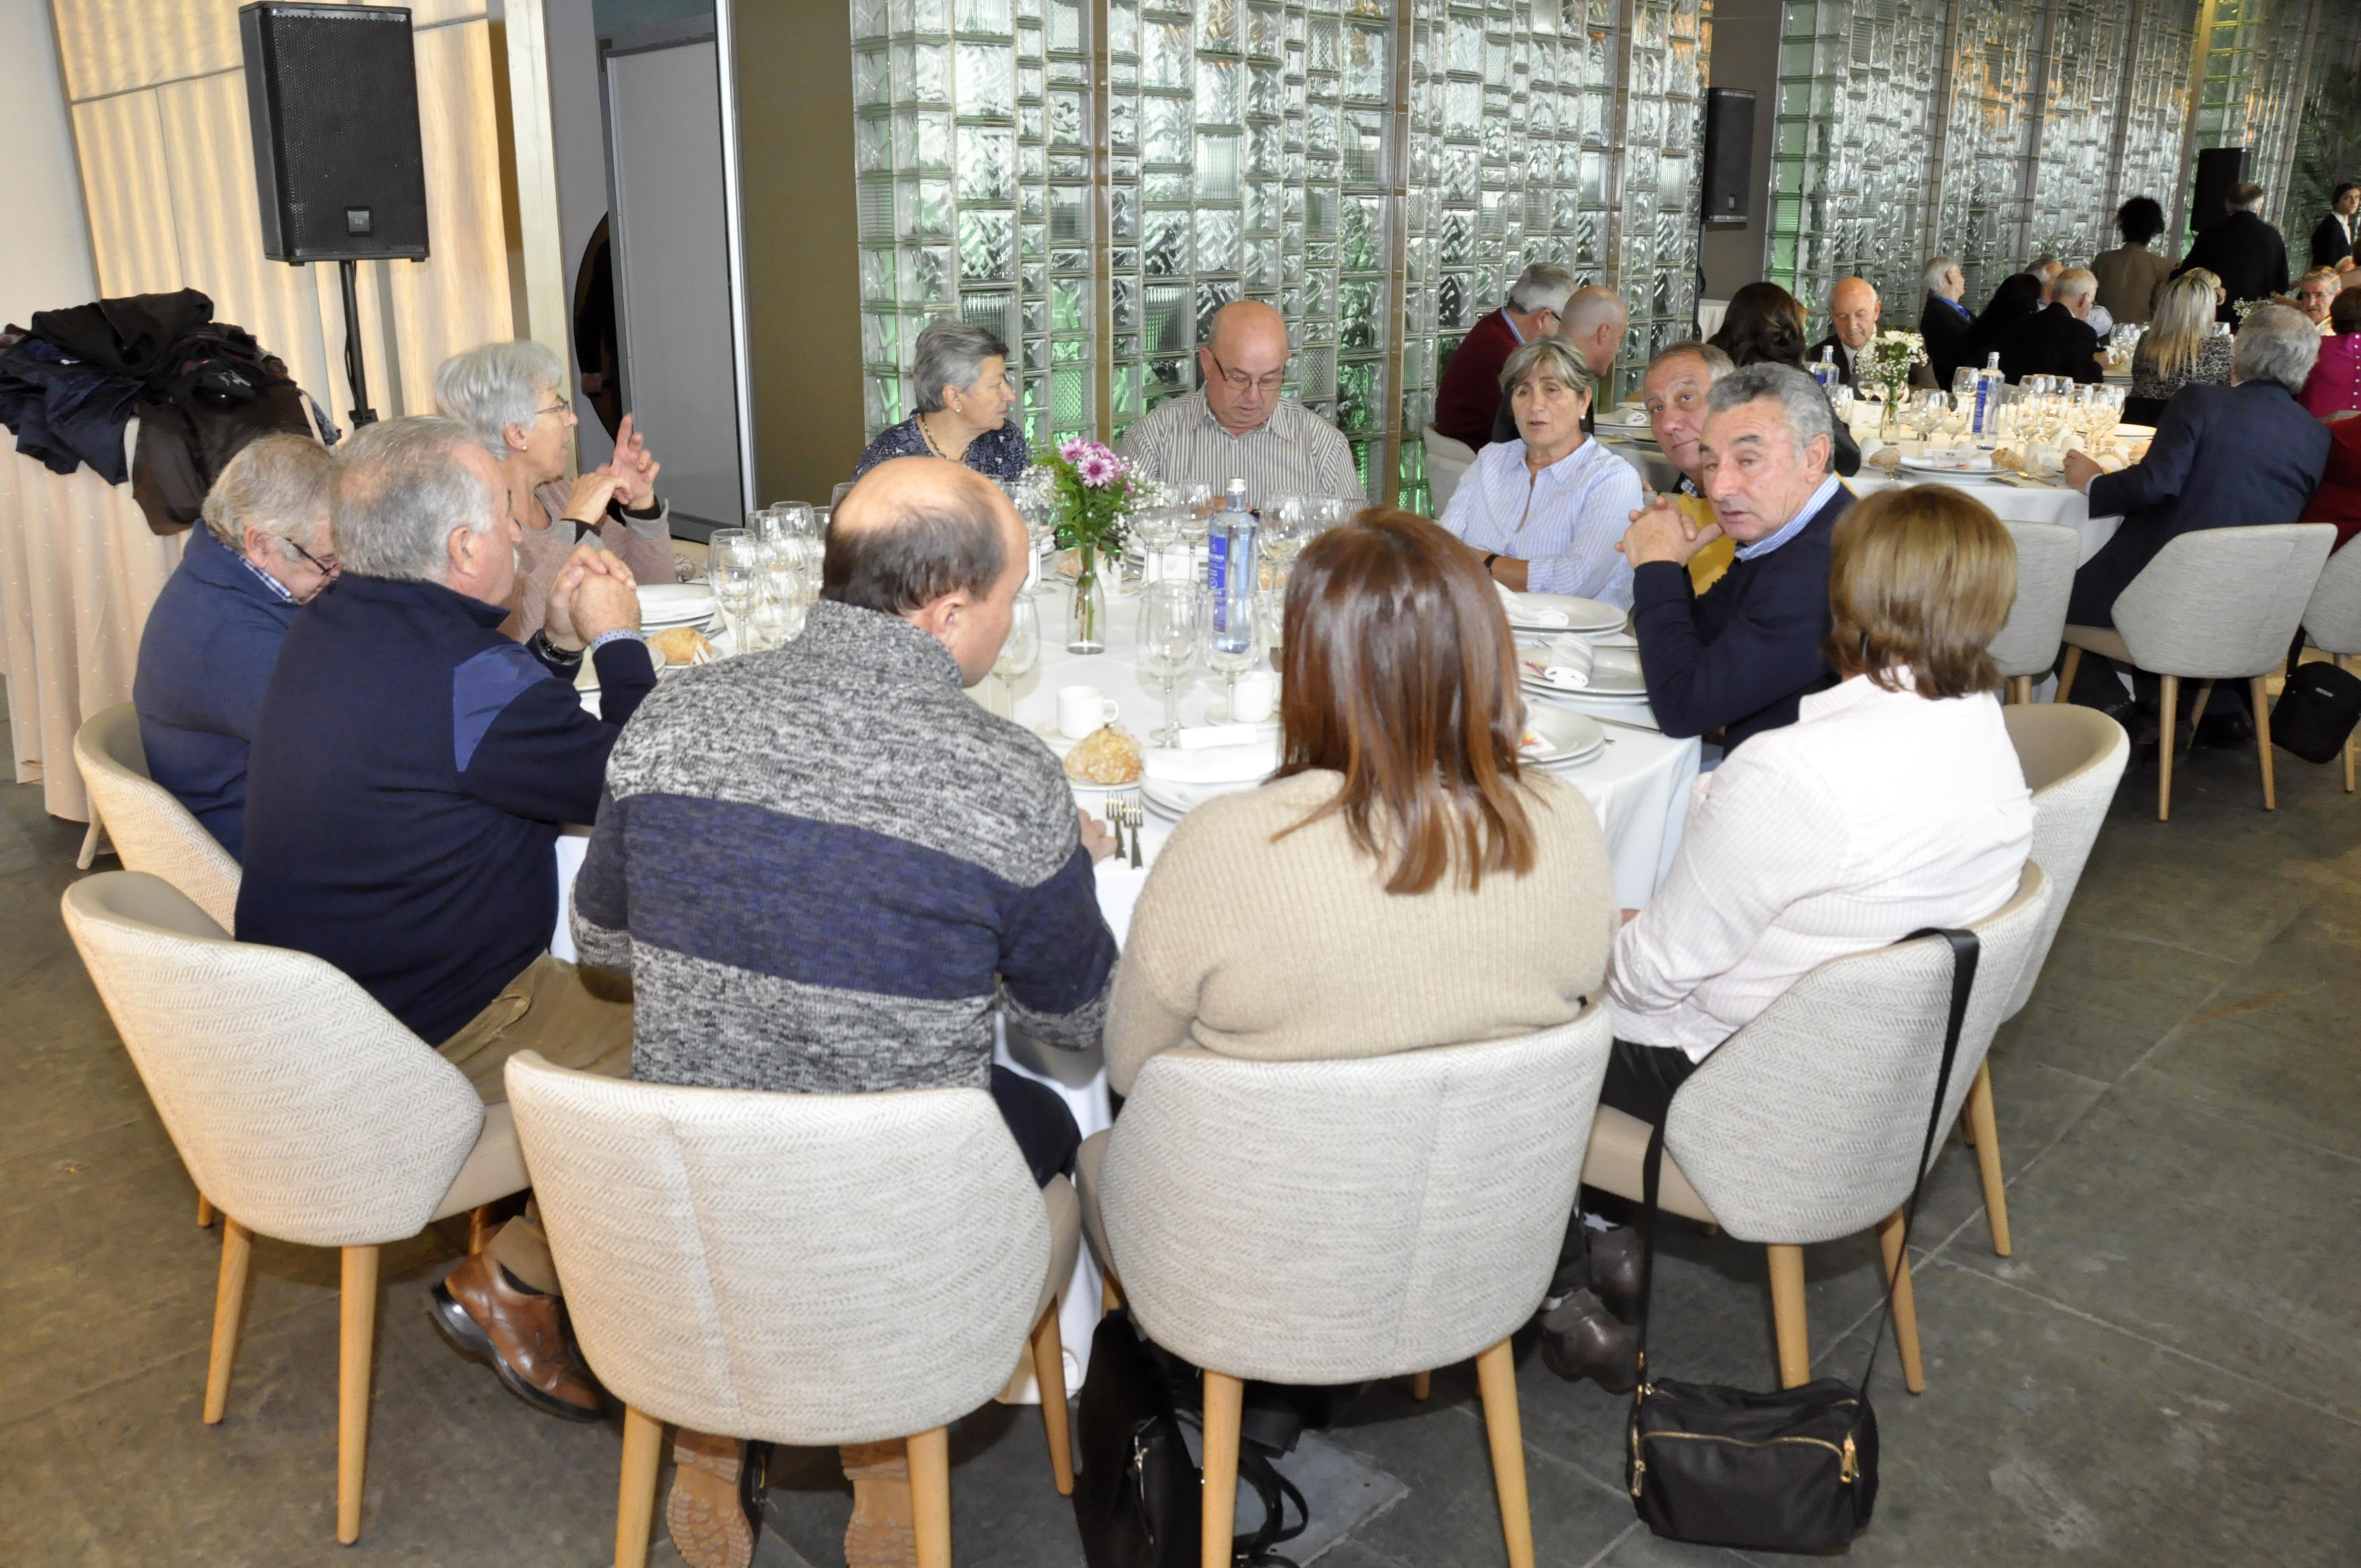 Federación Veciñal Castelao de Pontevedra